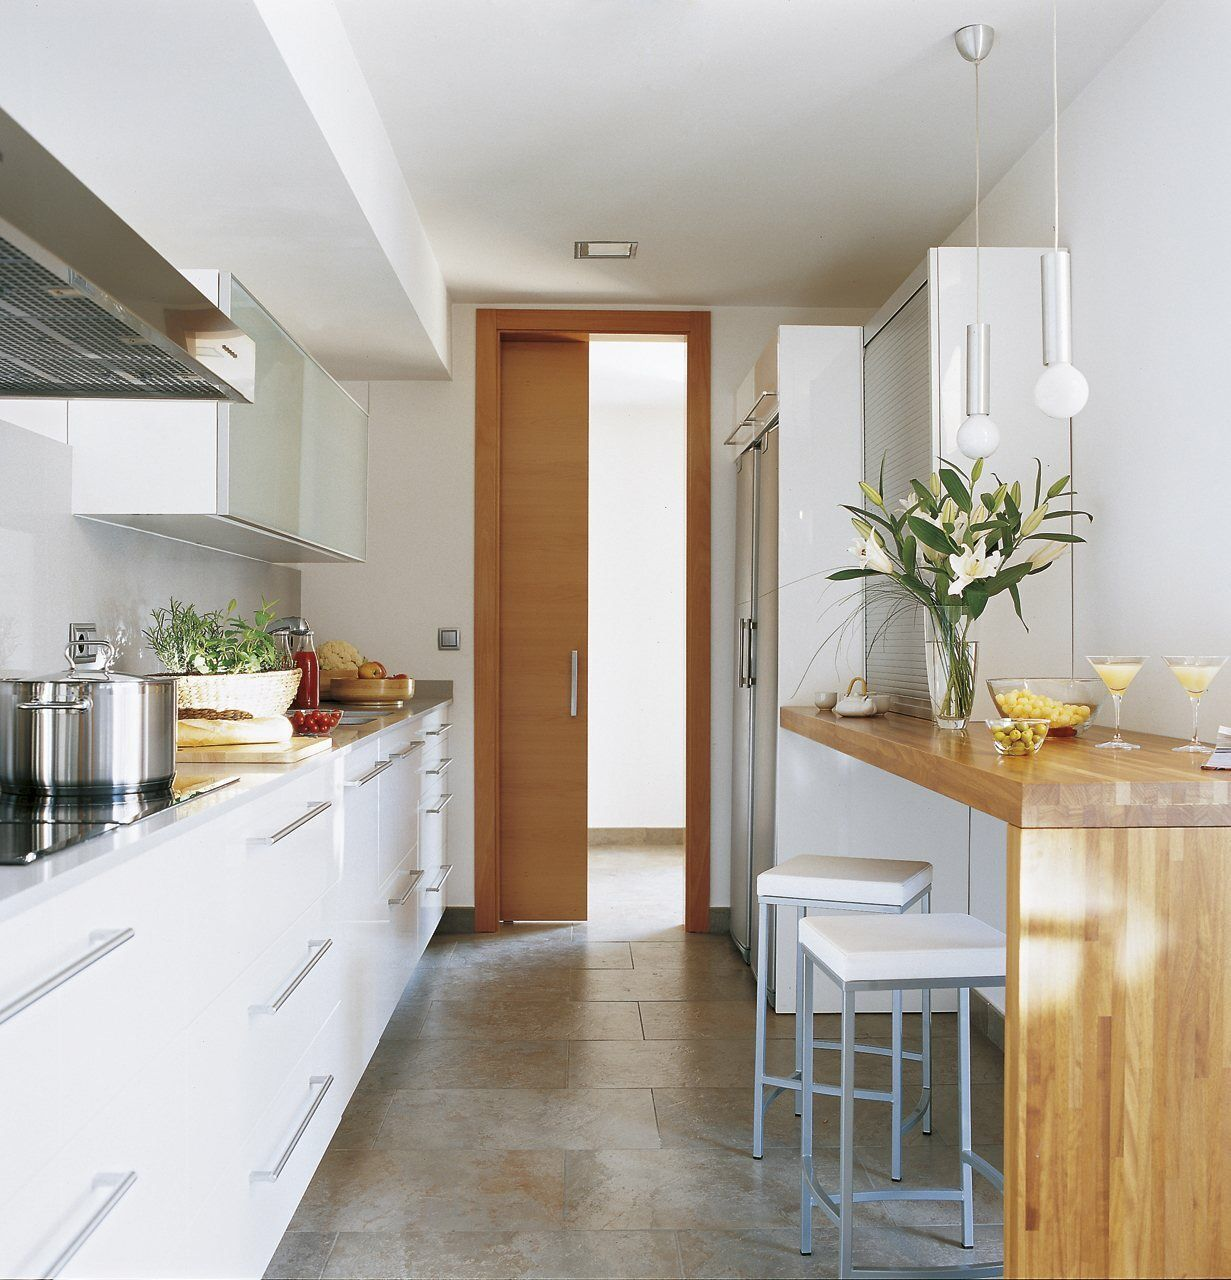 Small Traditional Galley Kitchen Ideas: 12 Reasonably Priced Slim Rectangular Kitchen Design Ideas